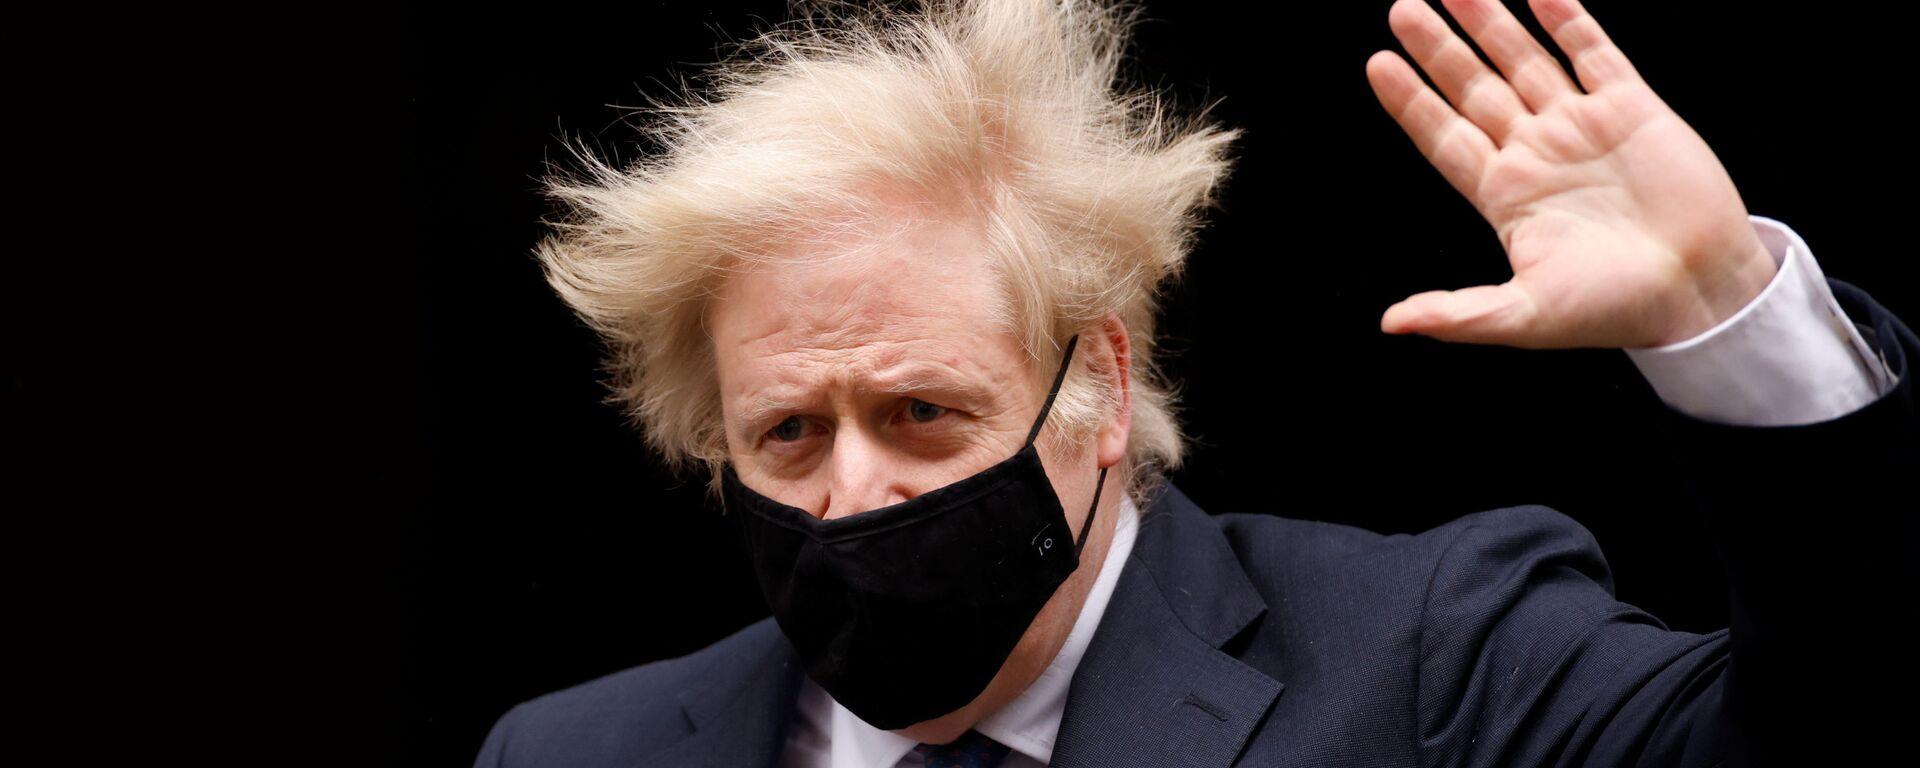 Britain's Prime Minister Boris Johnson gestures outside Downing Street in London, Britain, March 10, 2021 - Sputnik Italia, 1920, 20.07.2021